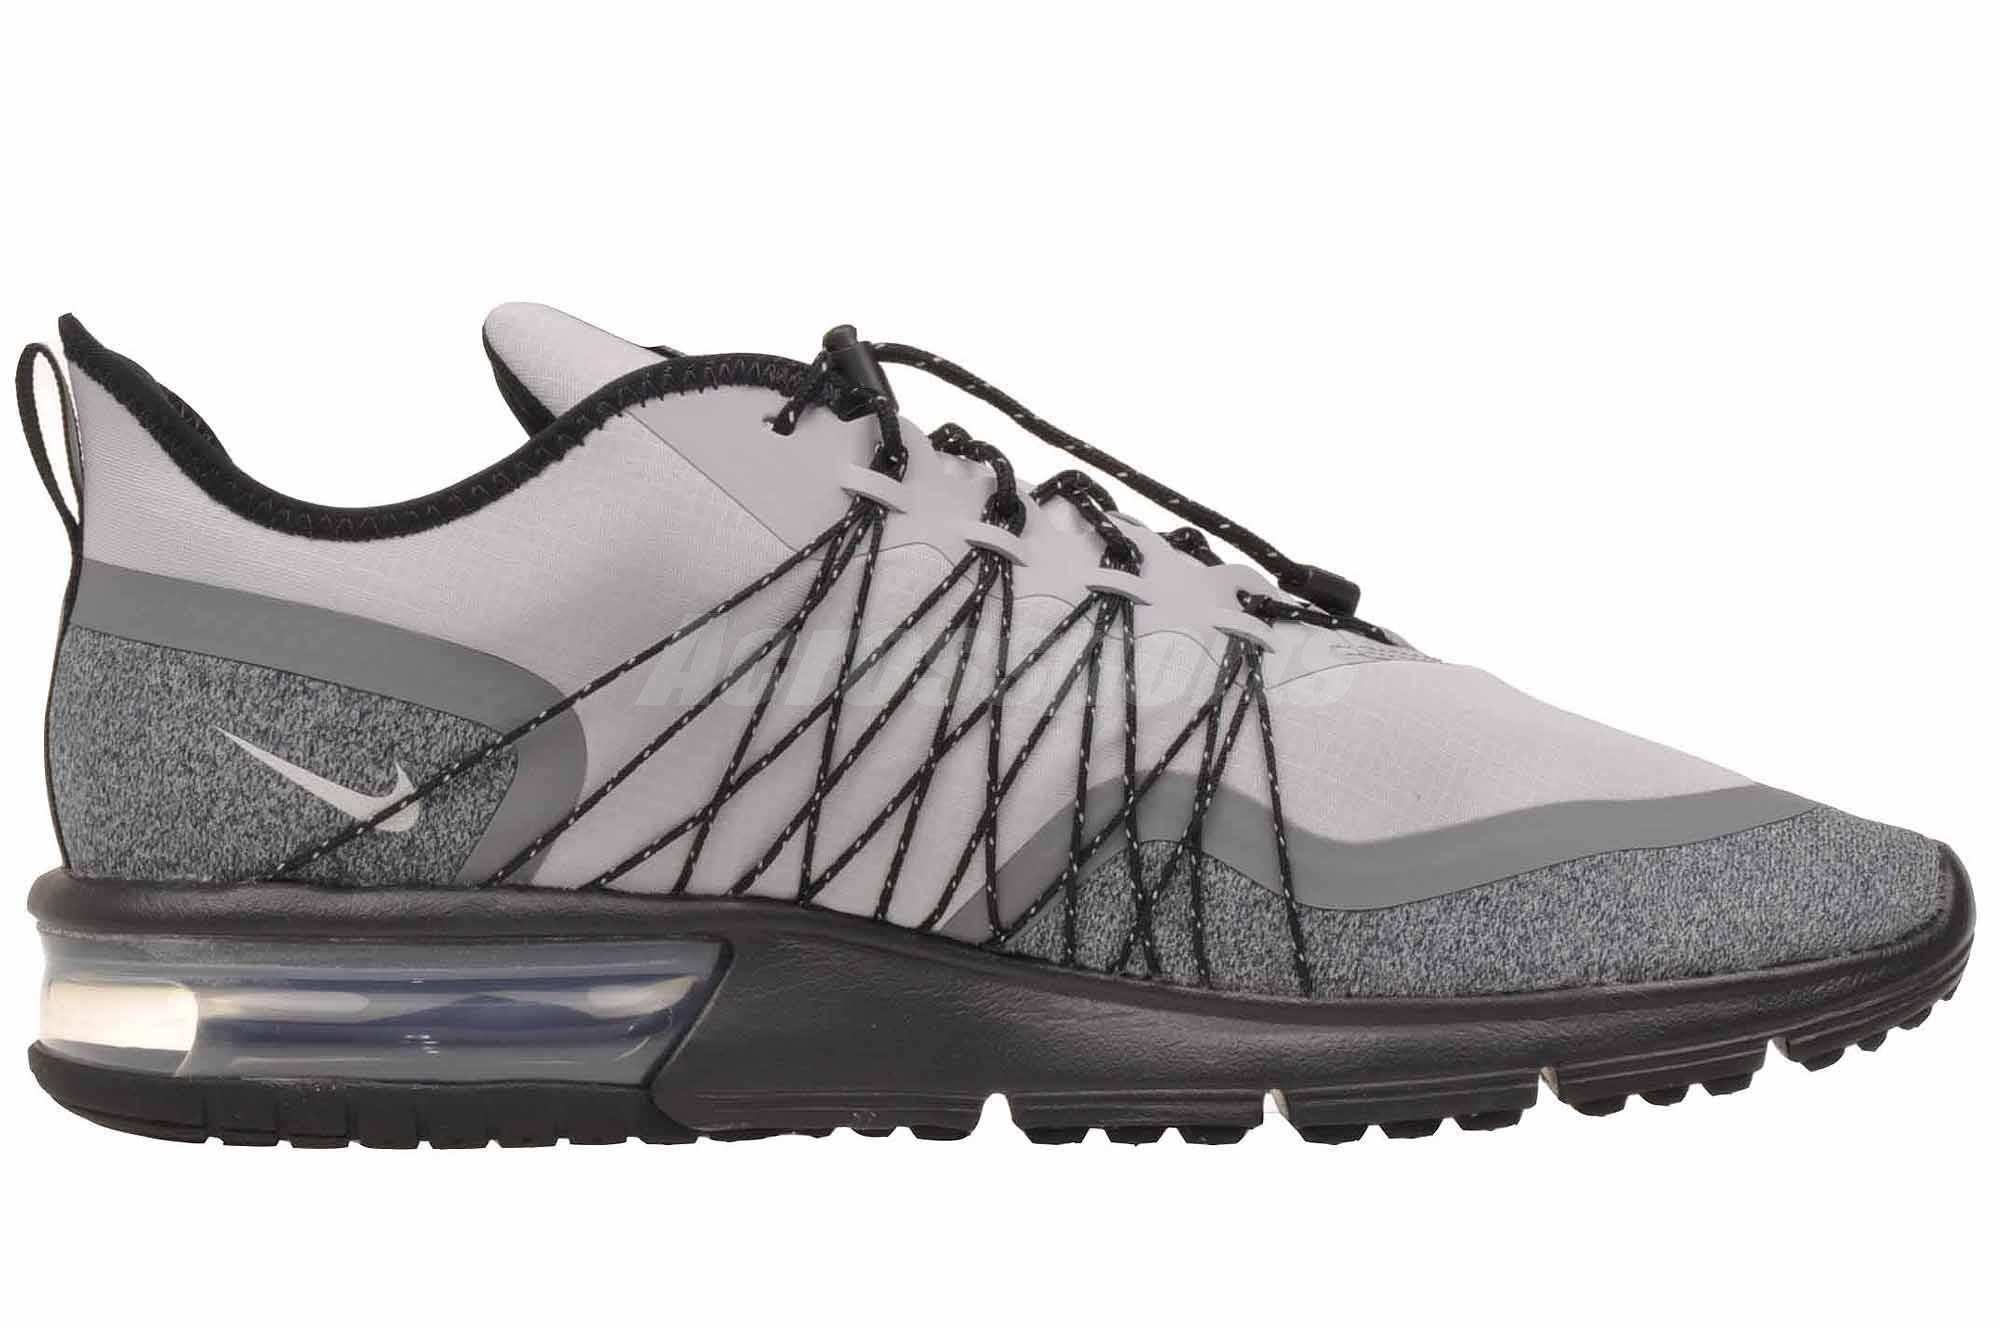 Detalles acerca de Nike Max Sequent 4 utilidad Correr Air Zapatos para hombre Gris Lobo AV3236 003 mostrar título original